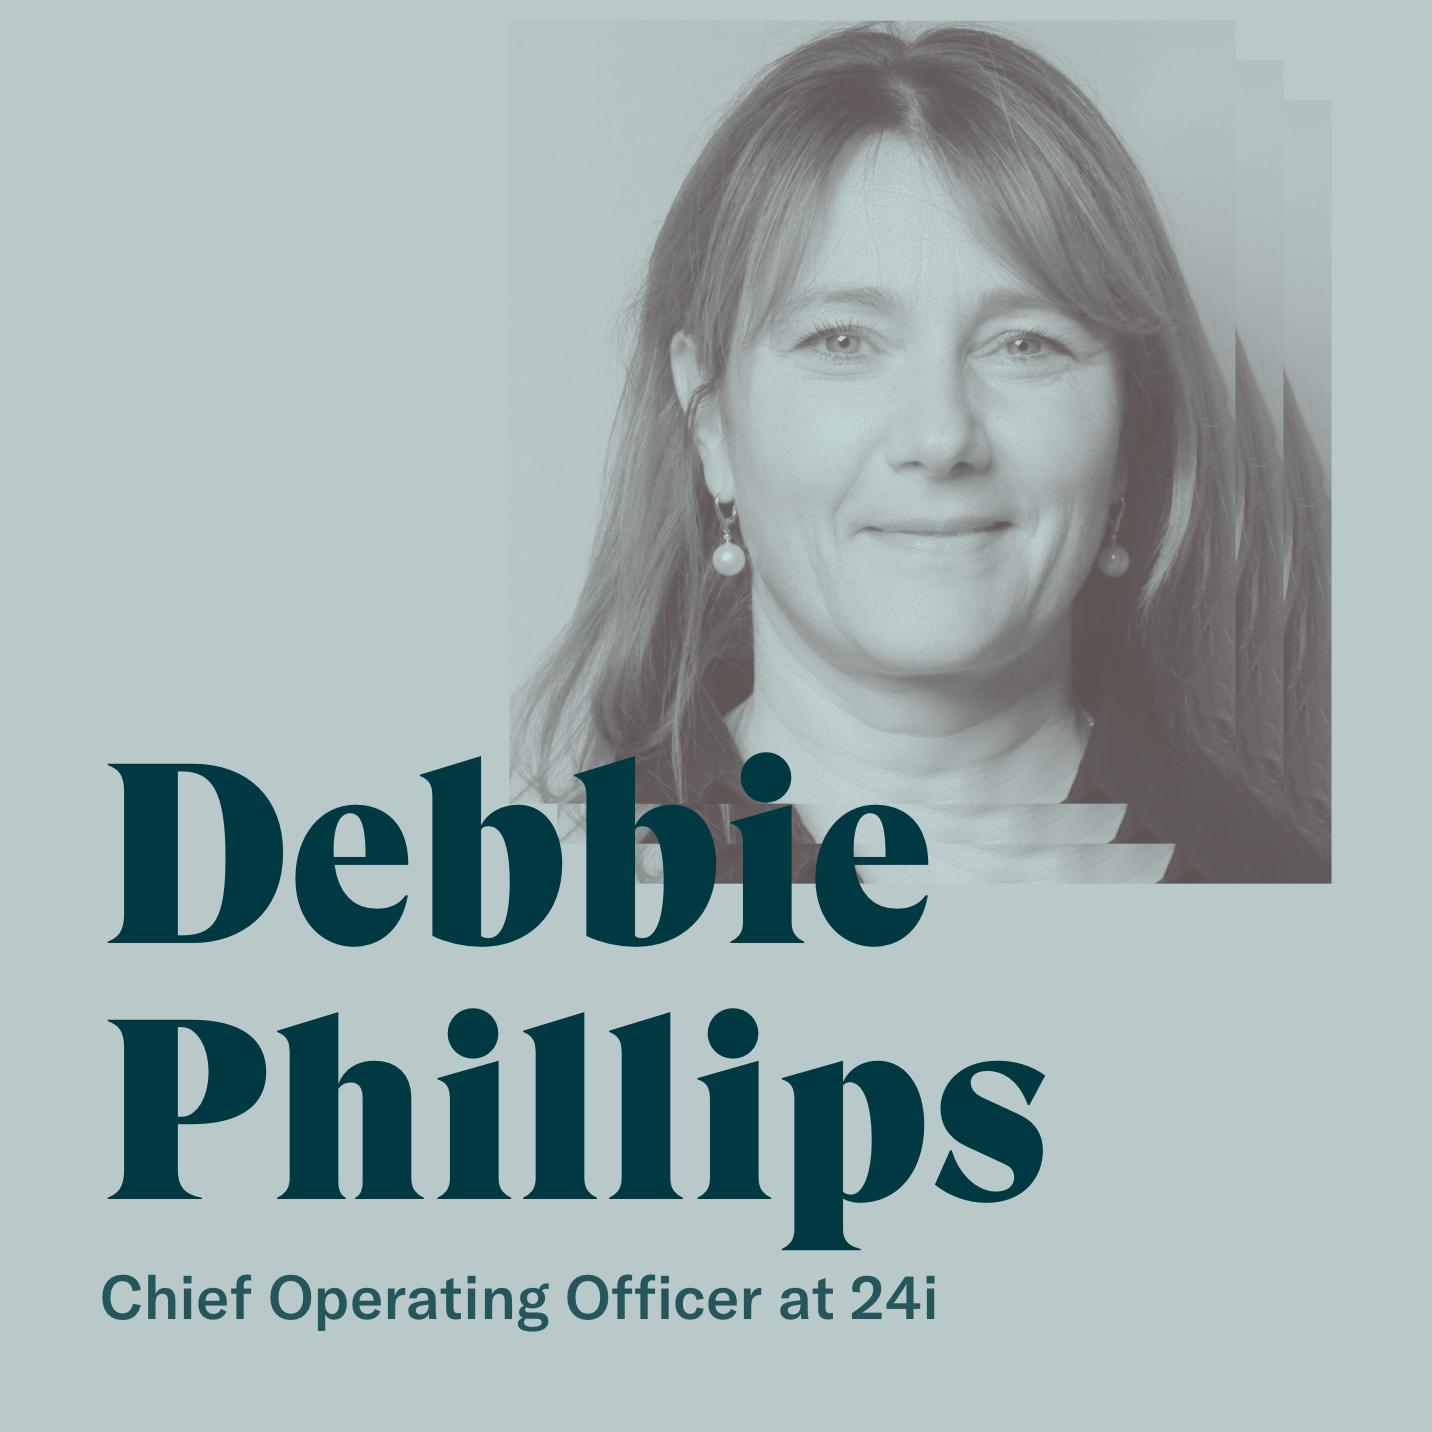 Debbie Phillips, COO, 24i